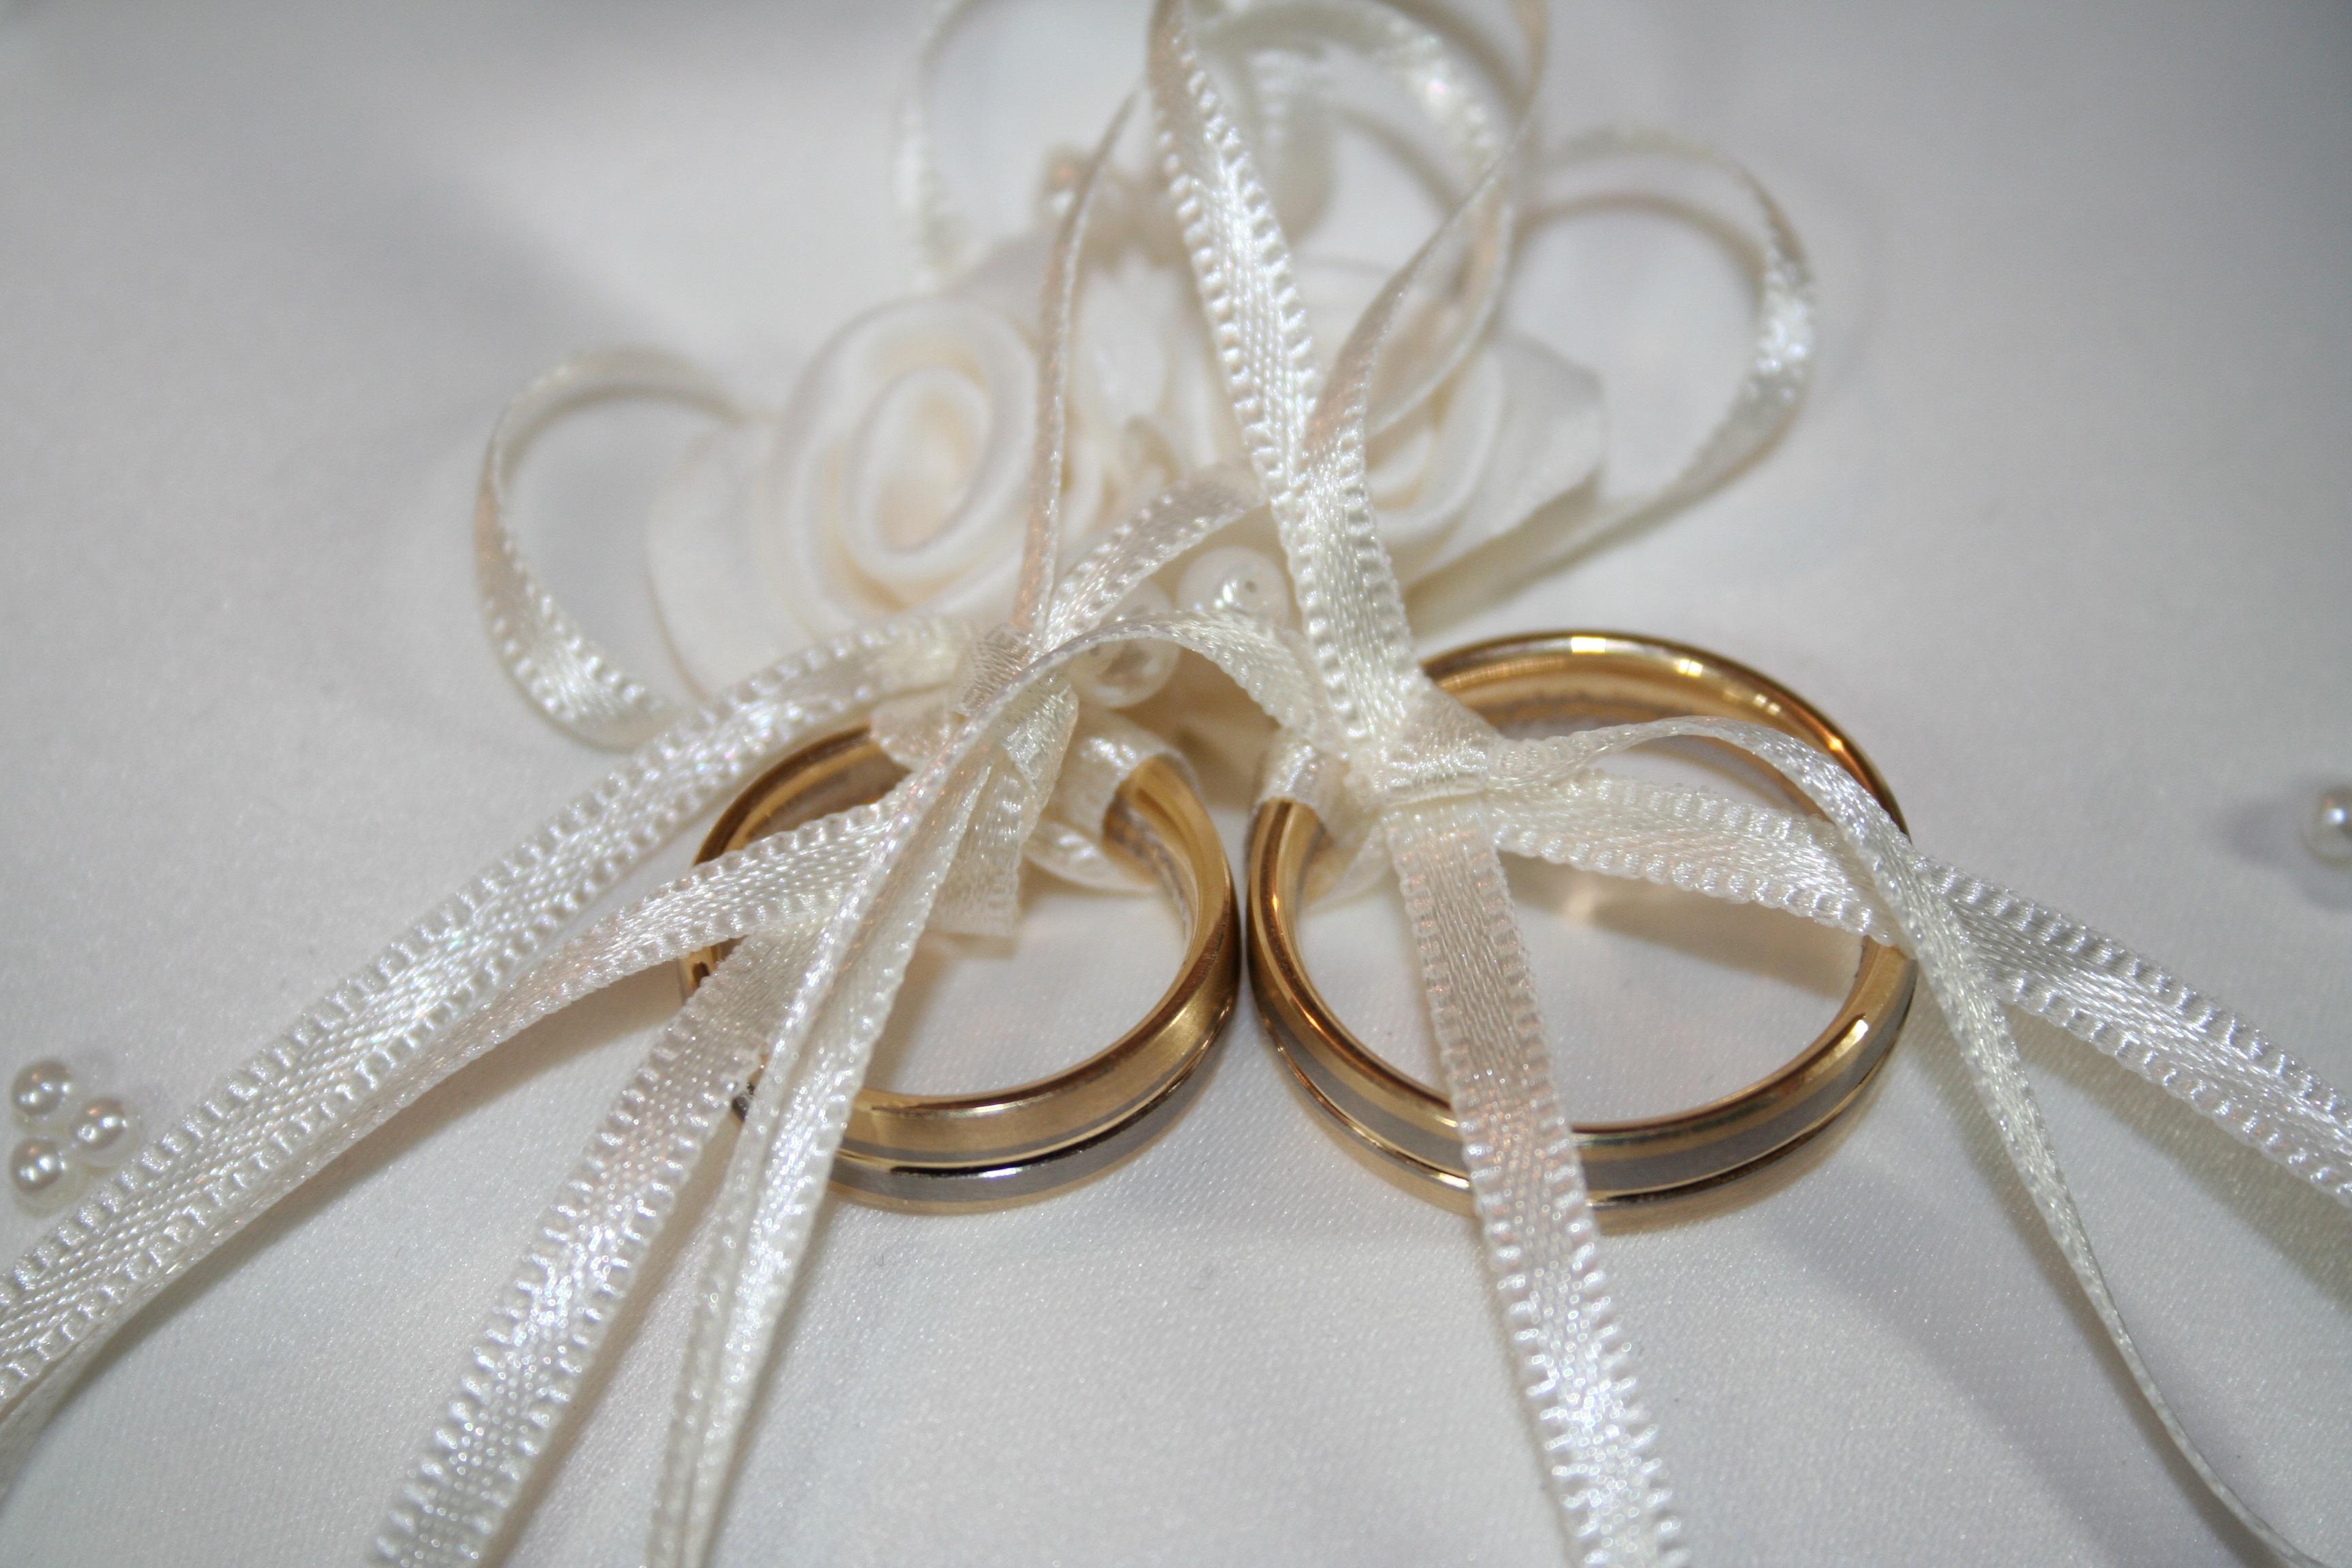 attractive wedding pillow hessian rustic original vintage ring rings cushion